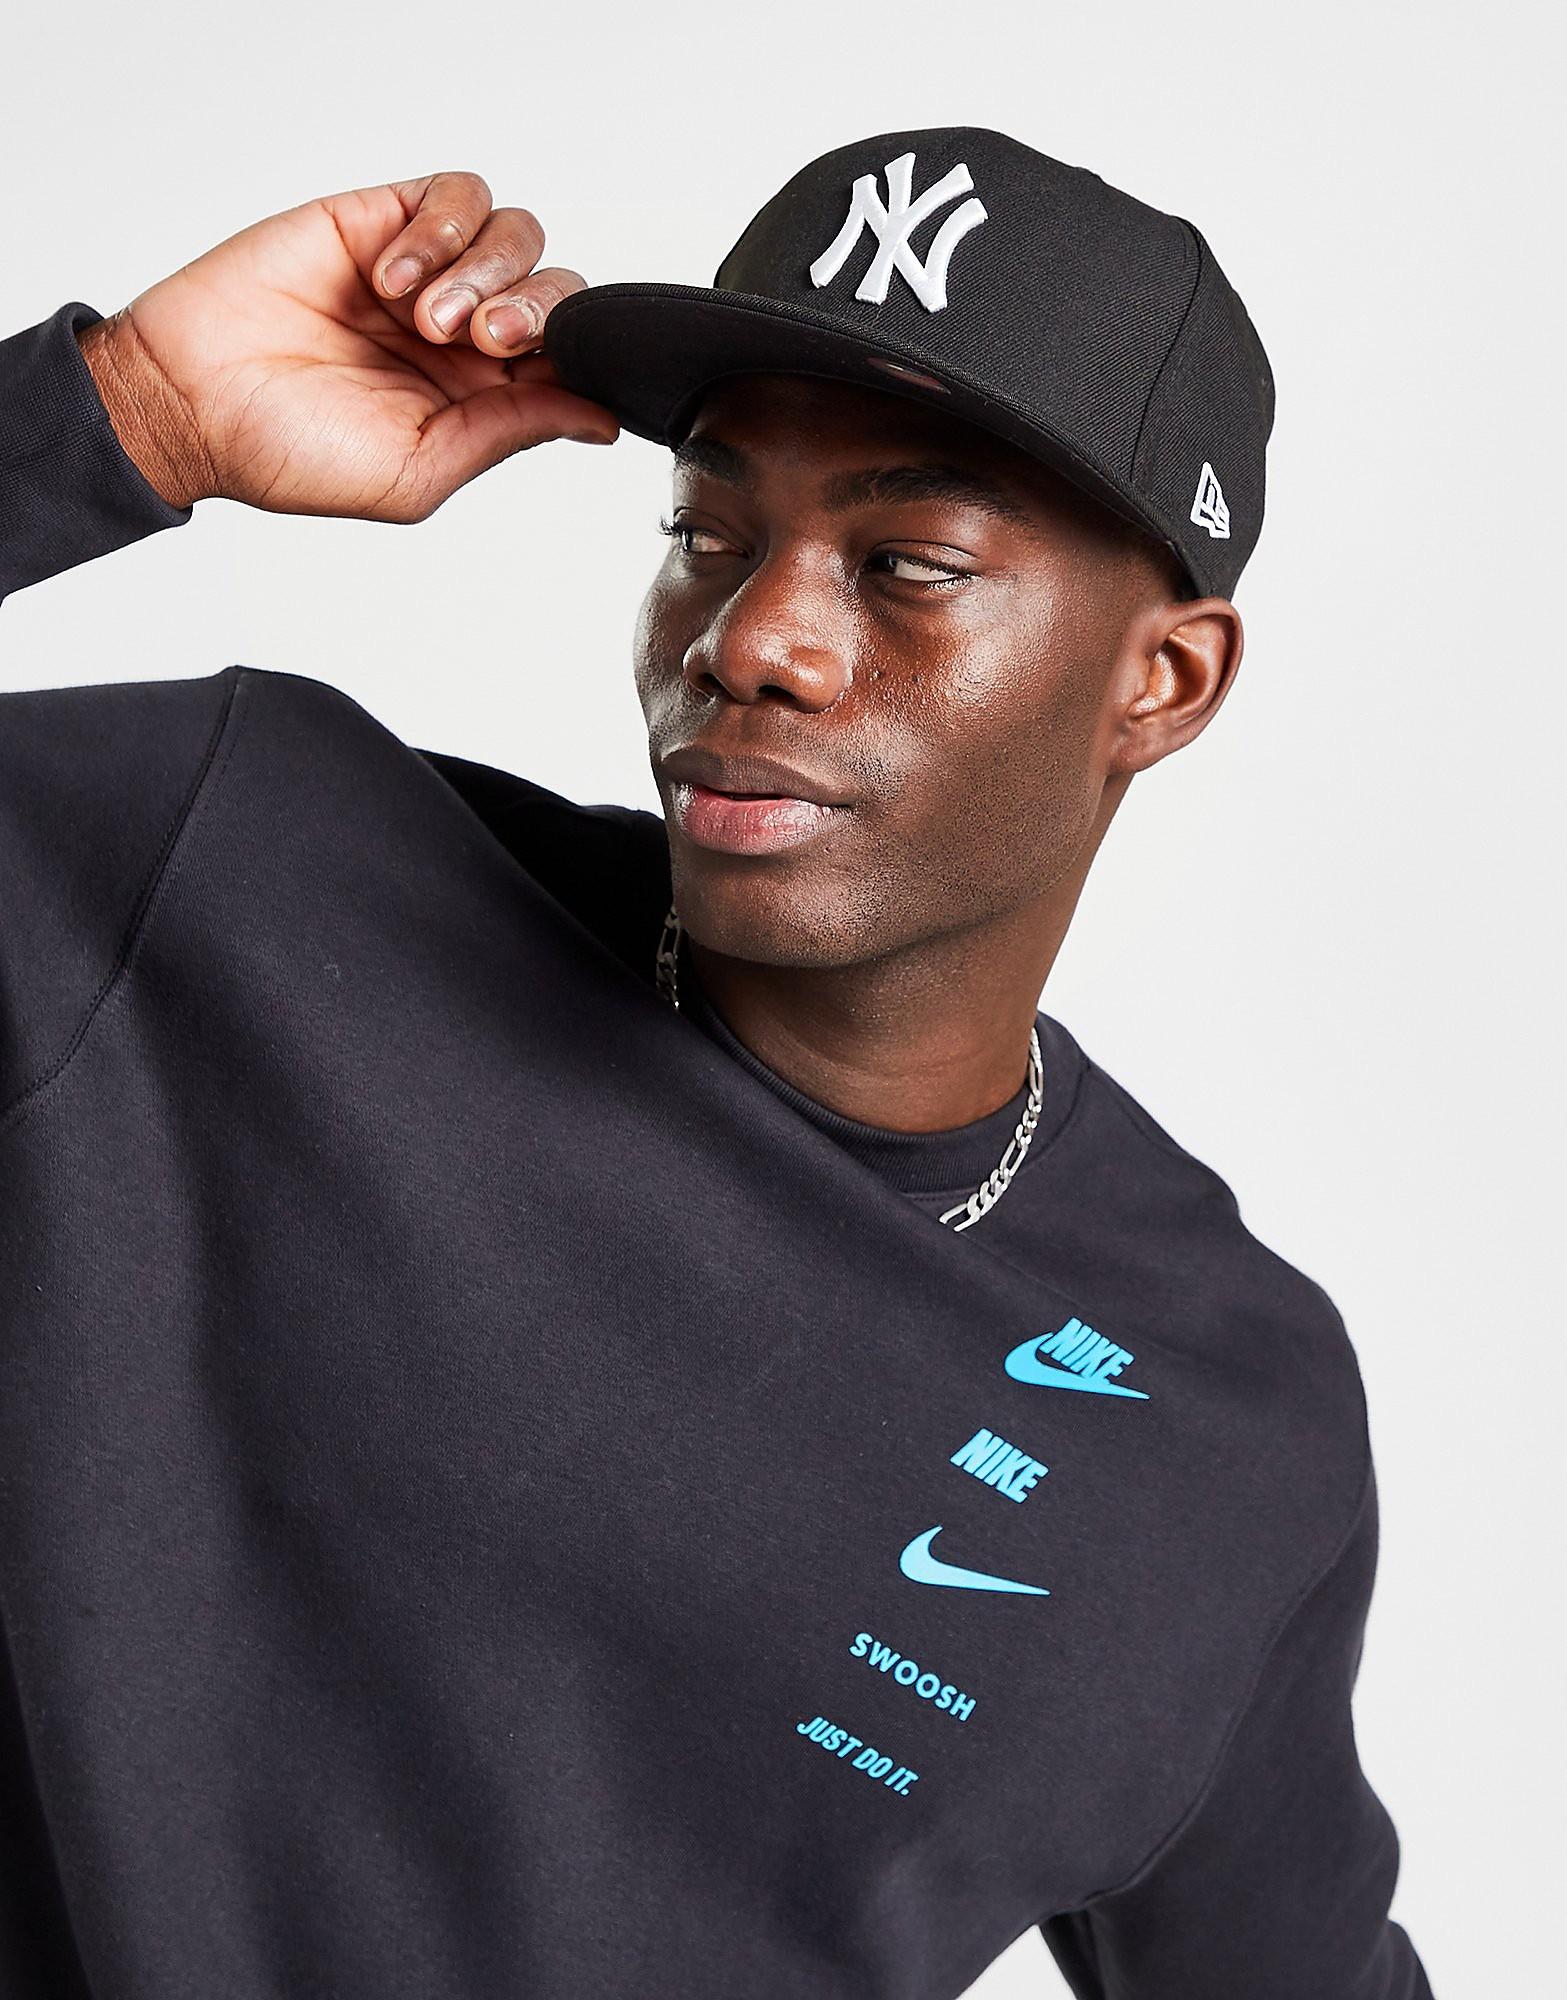 New Era MLB New York Yankees 59FIFTY Fitted Cap - Black/White - Mens, Black/White